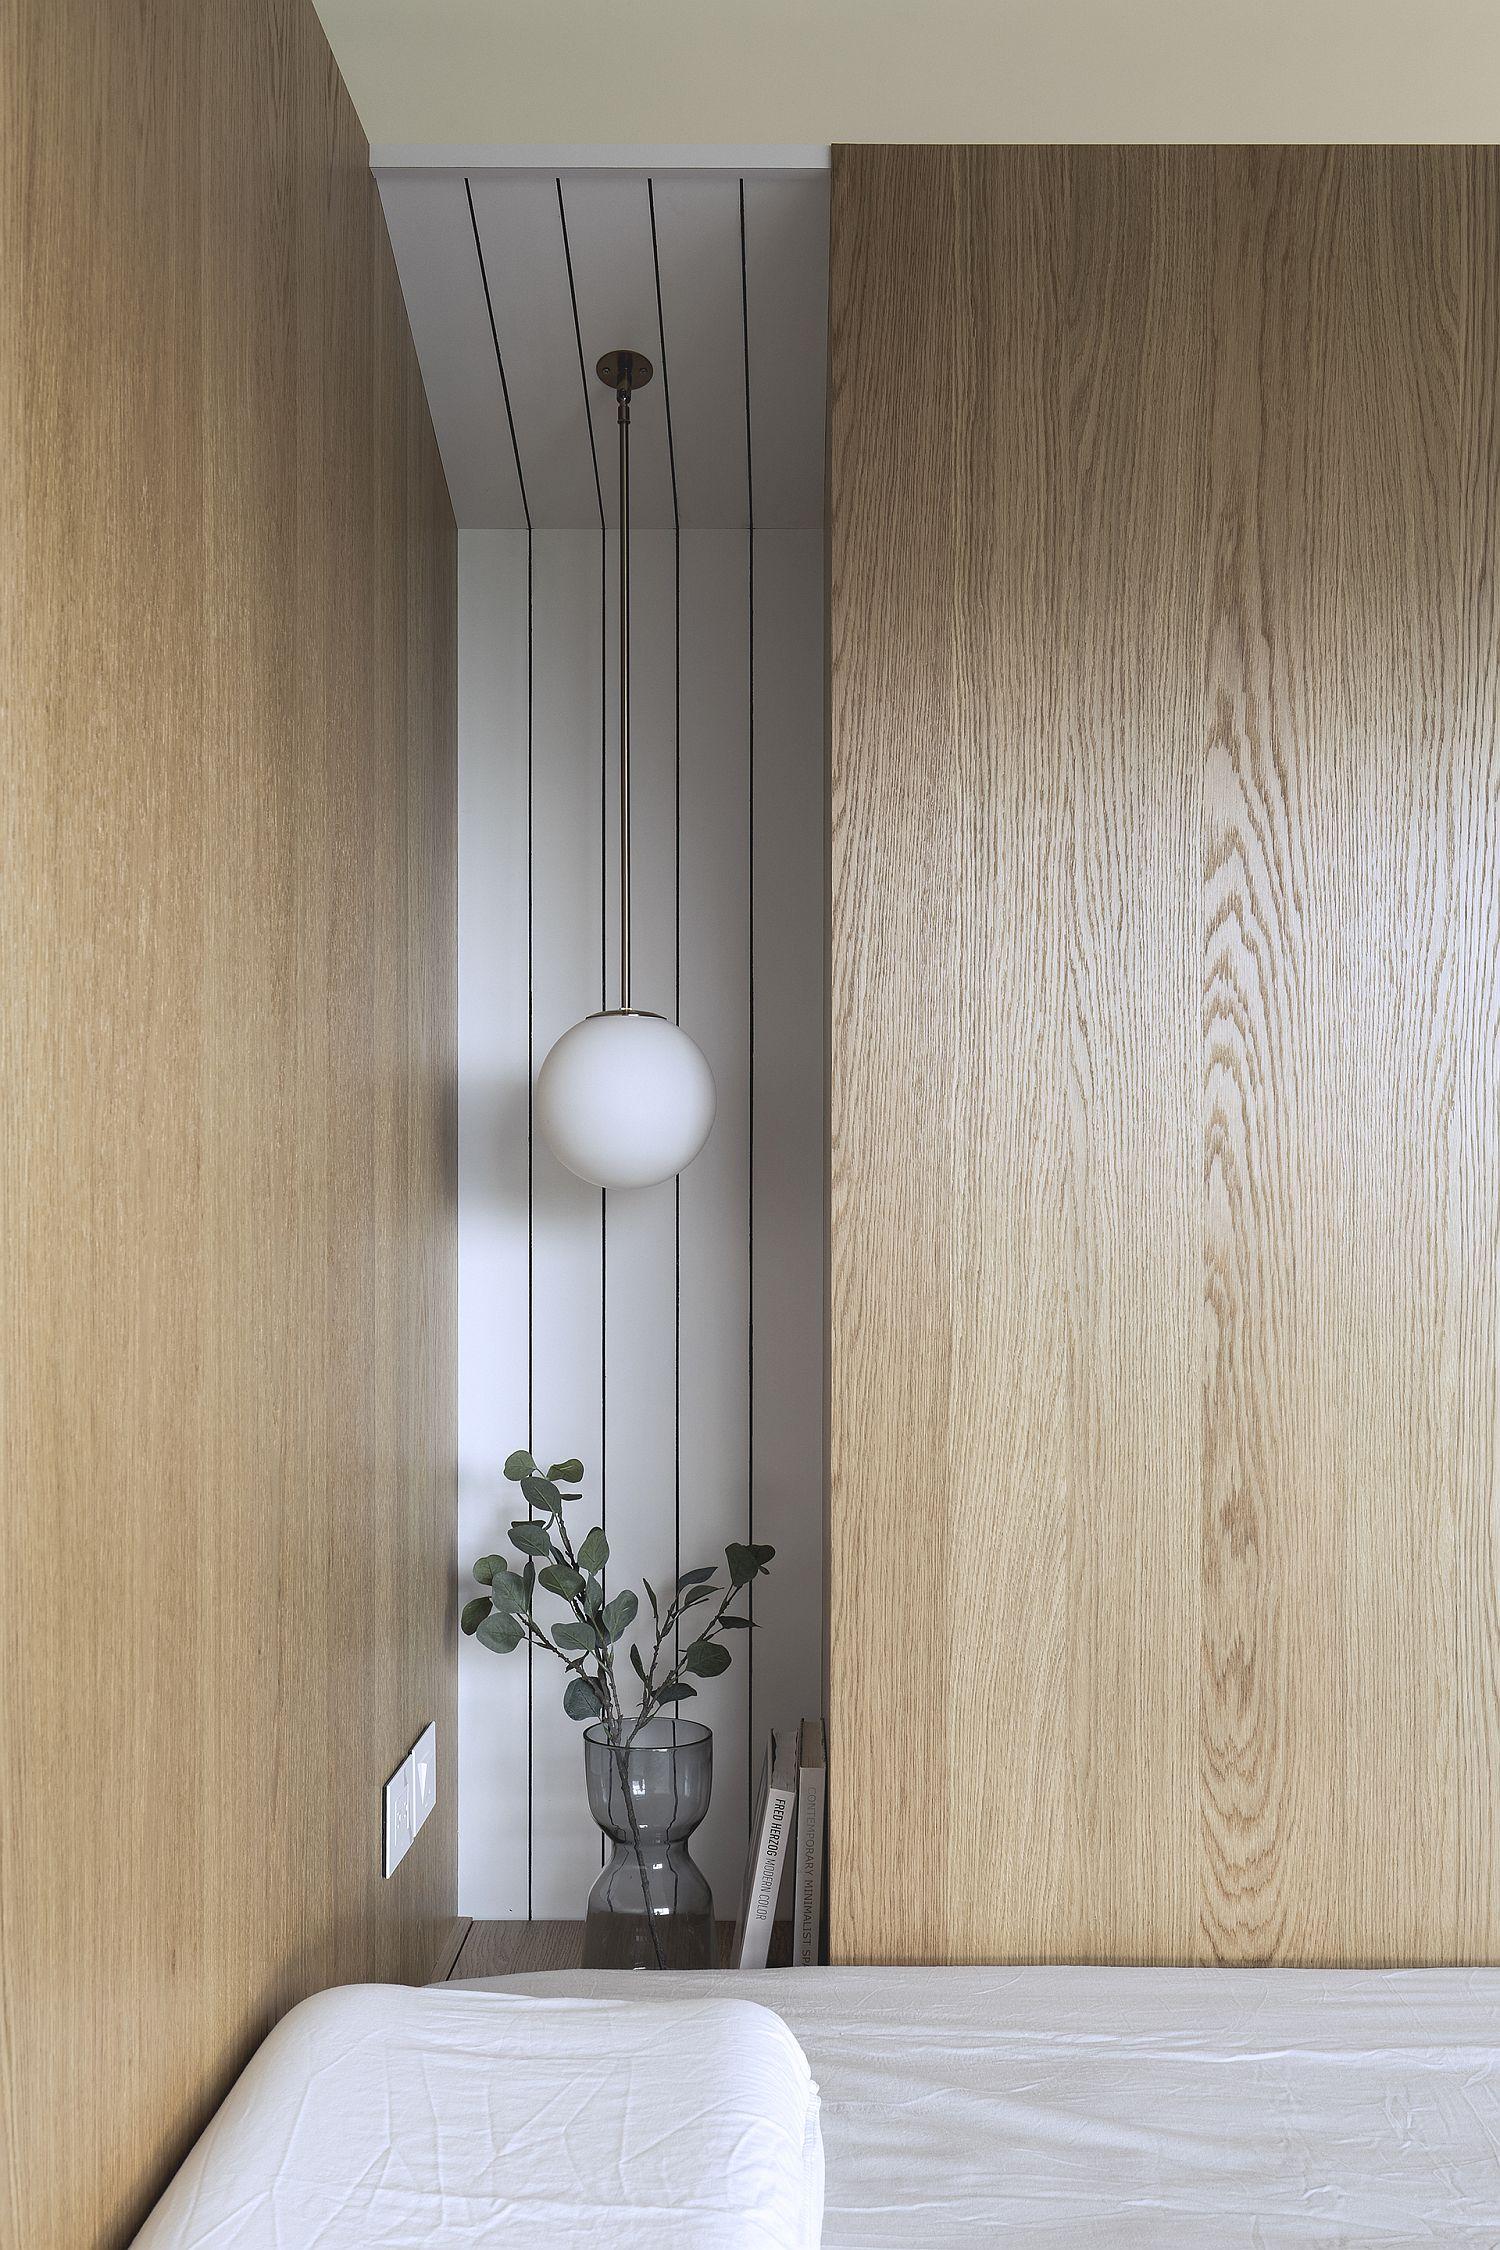 Decorating the bedroom corner in minimal style